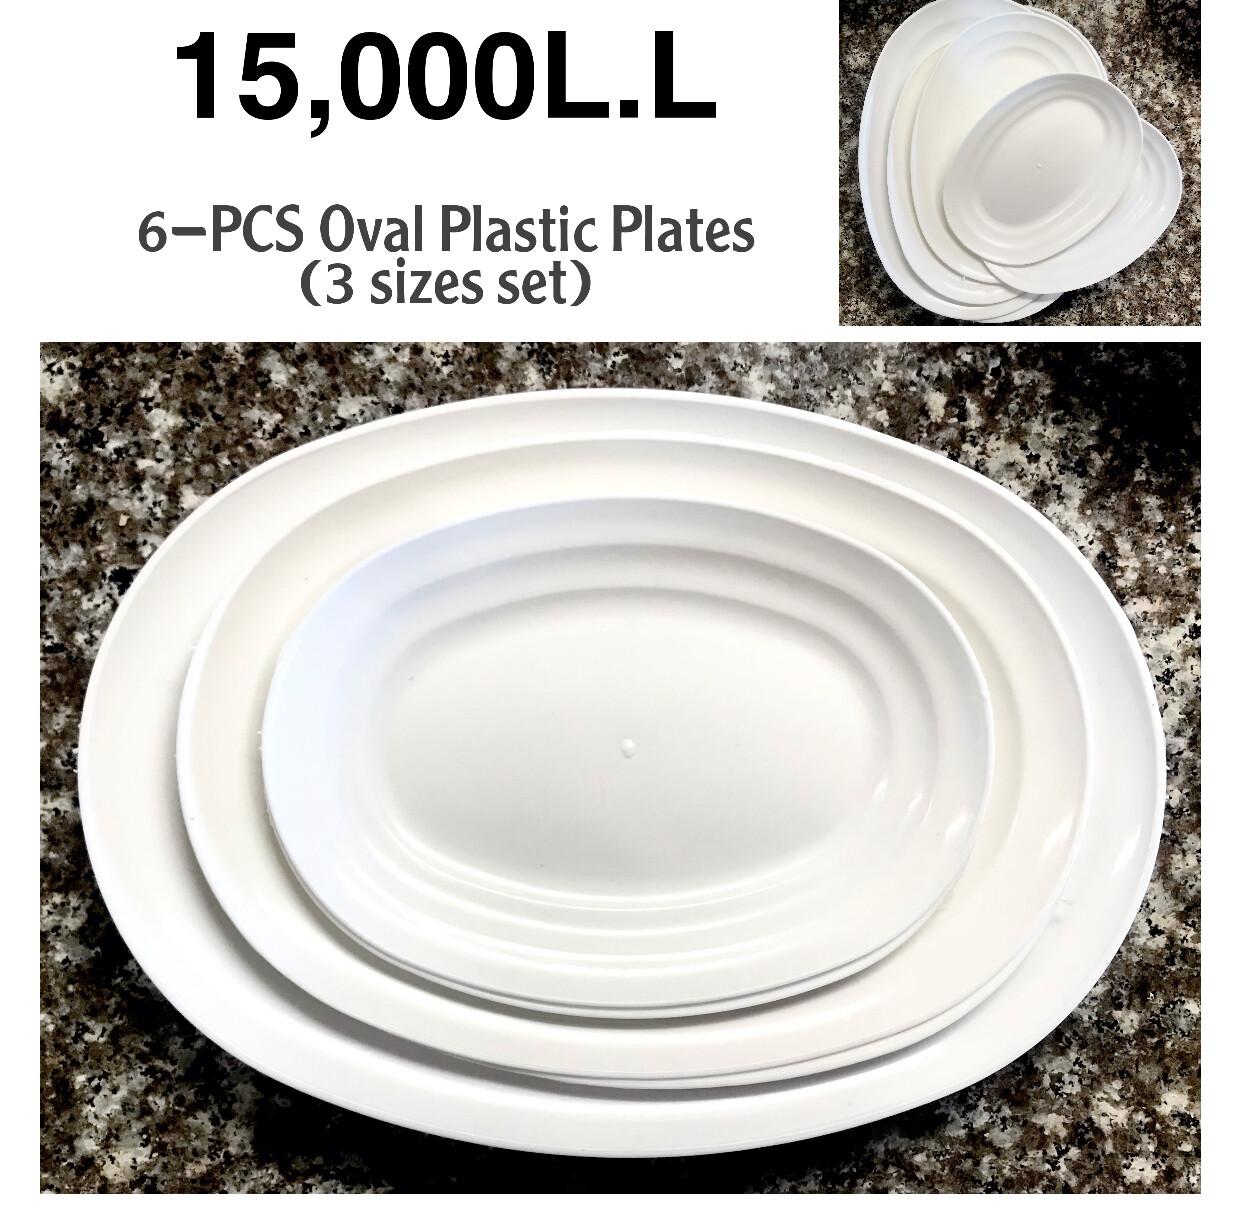 6-Pcs Oval Plastic Plates